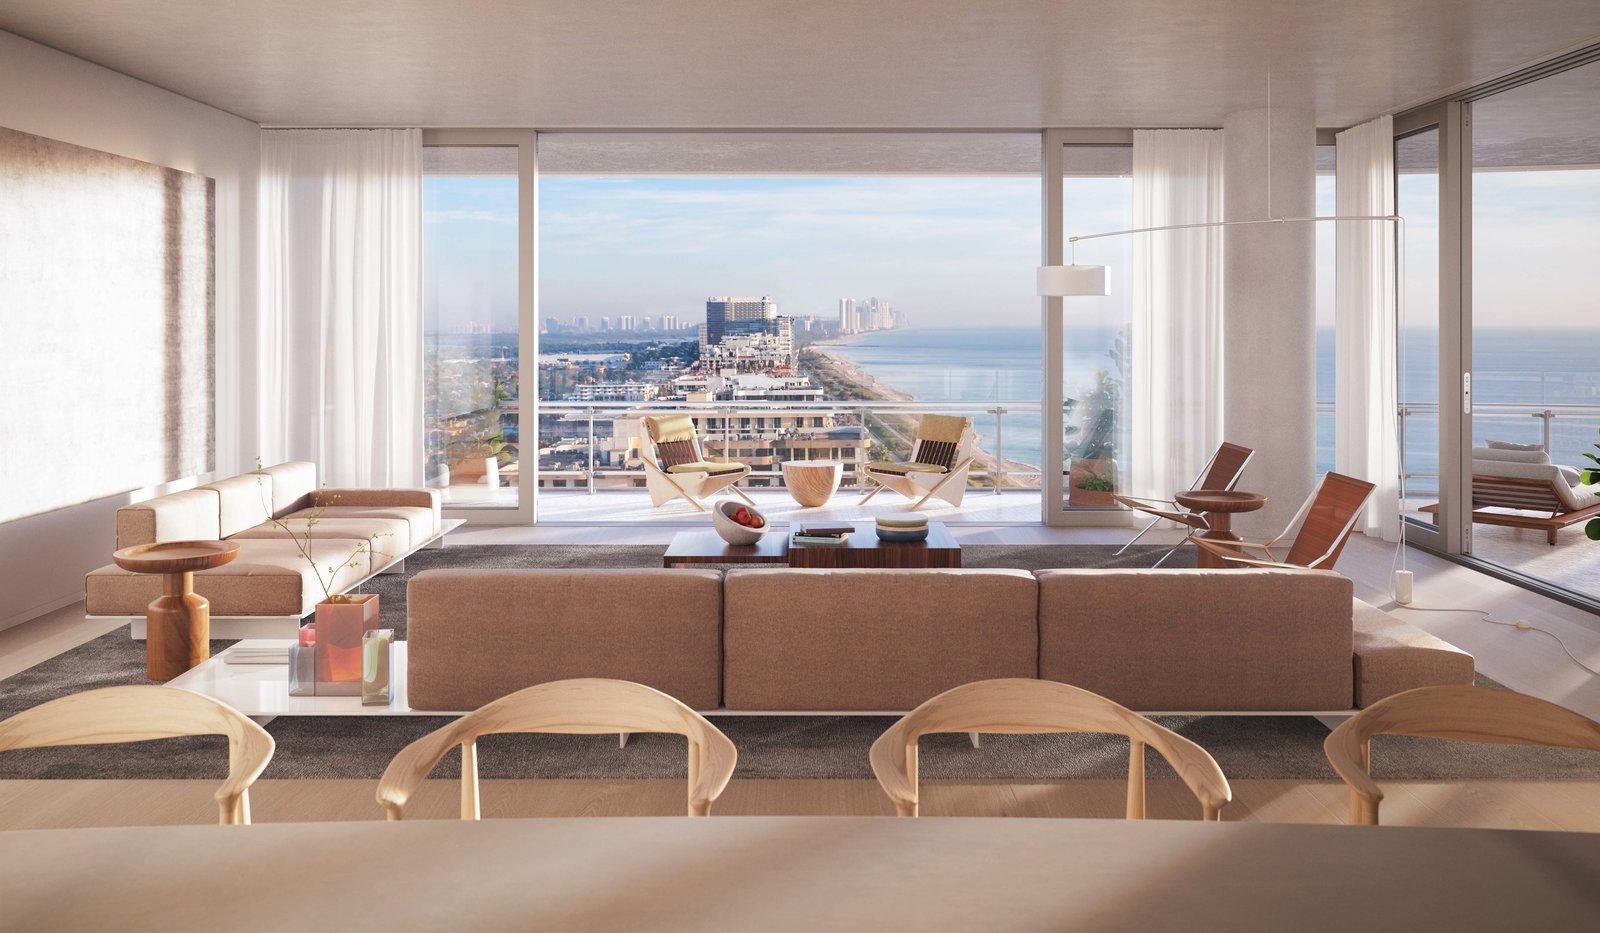 Photo 1 of 8 in Sneak Peek of Renzo Piano's New Stunning Oceanfront Condominiums in Miami's North Beach